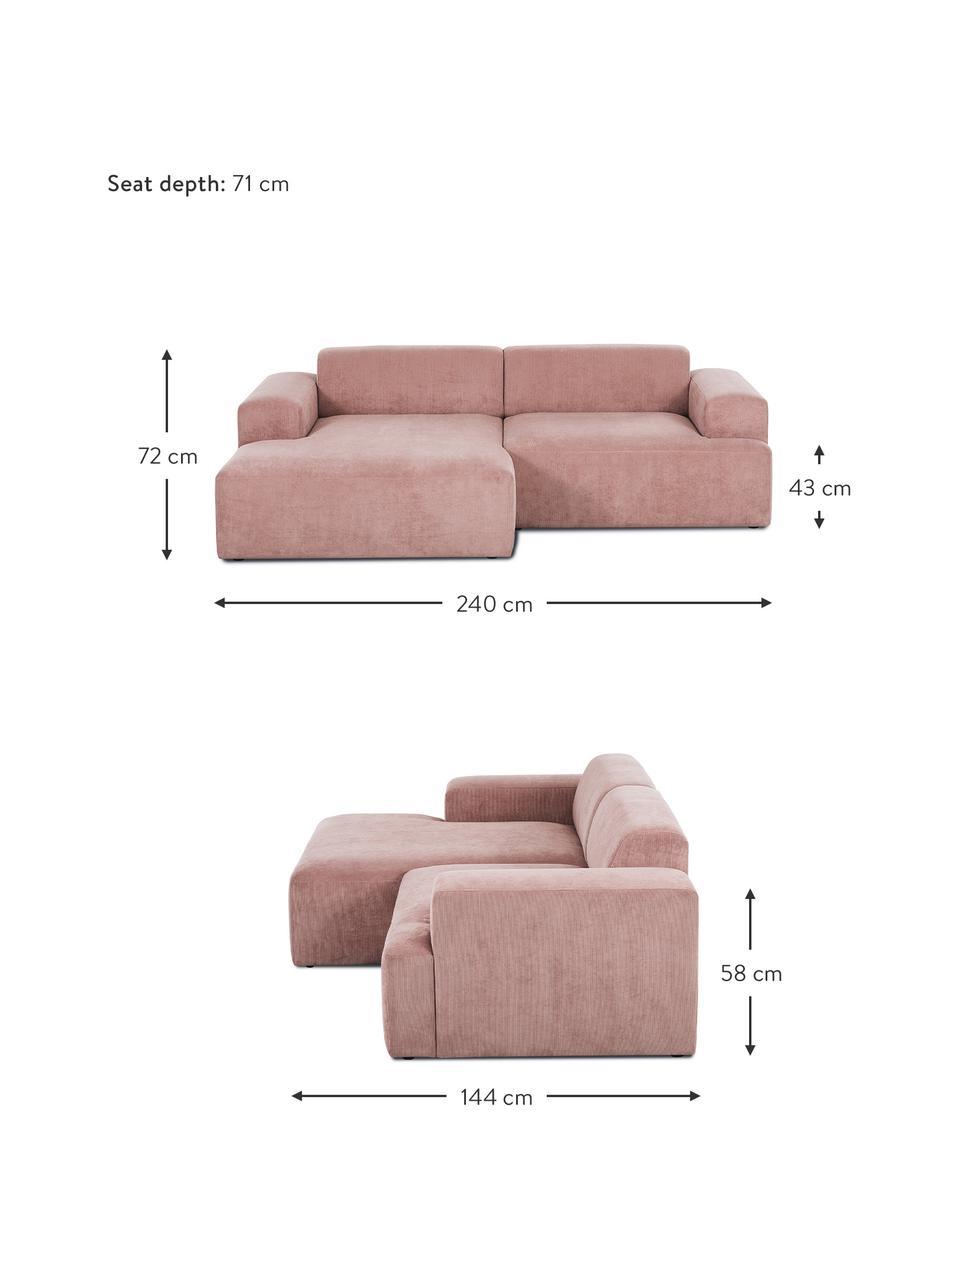 Cord-Ecksofa Melva (3-Sitzer) in Rosa, Bezug: Cord (92% Polyester, 8% P, Gestell: Massives Kiefernholz, Spa, Füße: Kiefernholz Die Füße befi, Cord Rosa, B 240 x T 144 cm